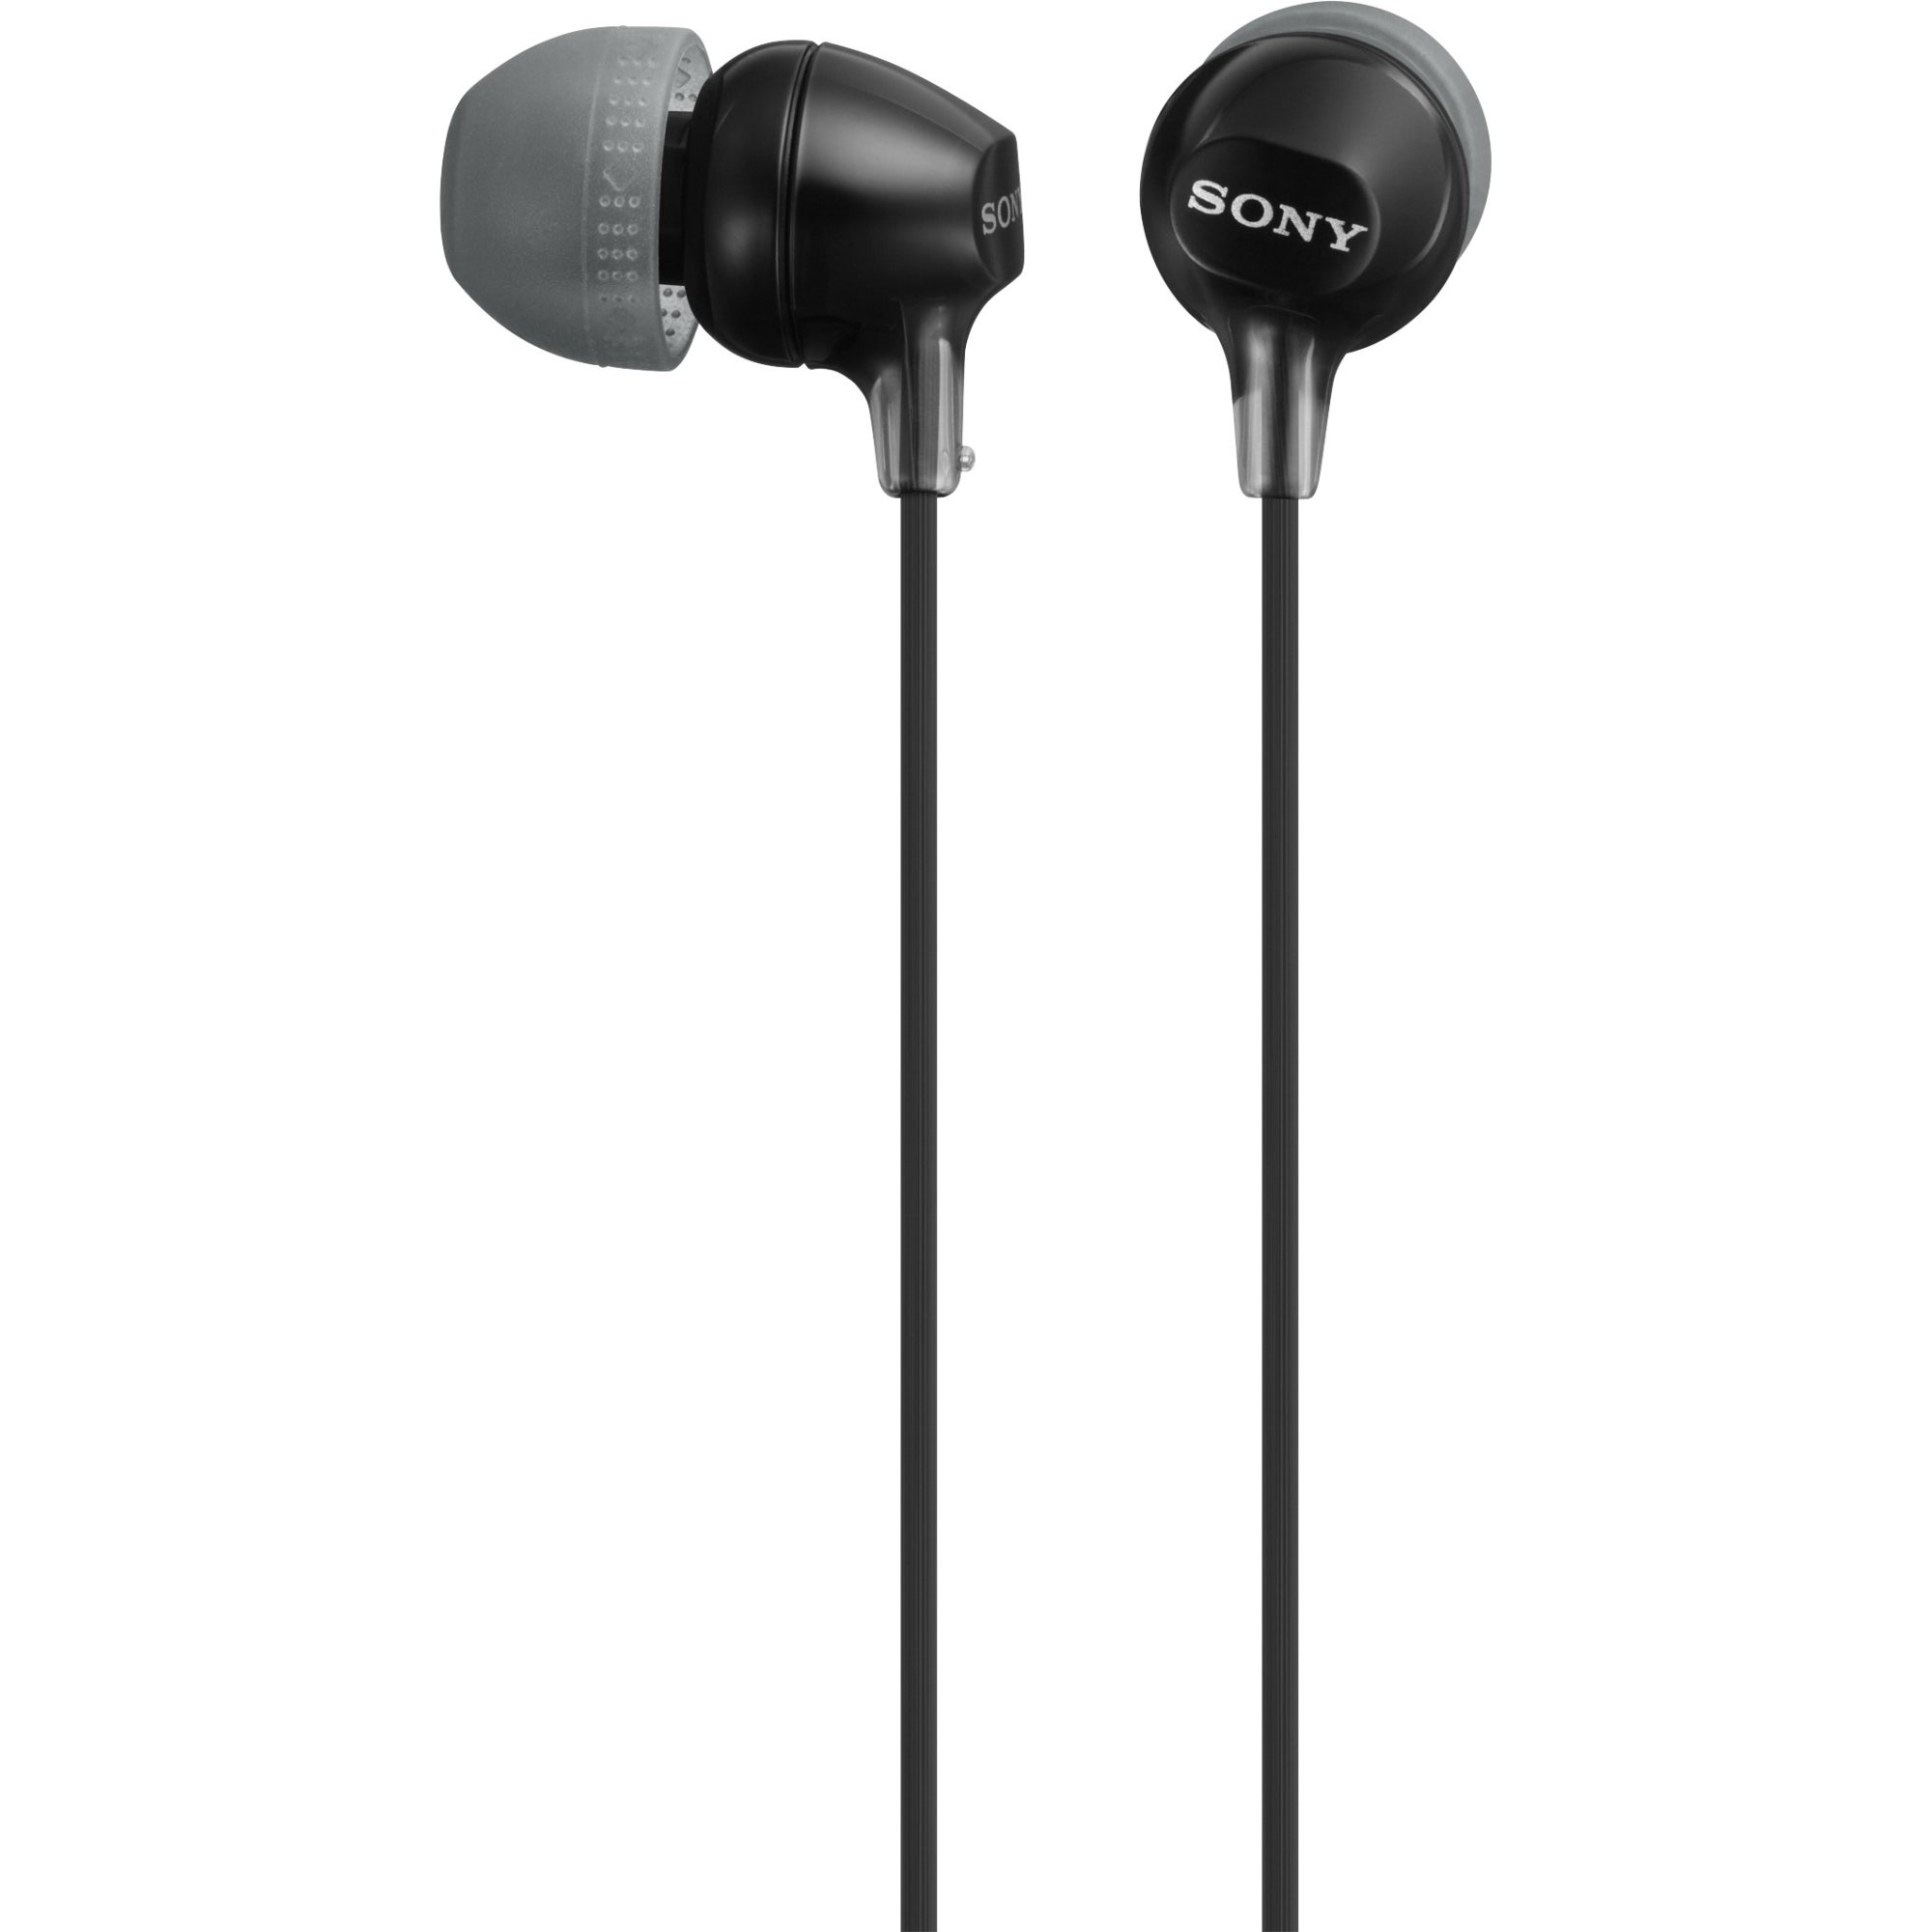 Sony Fashion Color EX Series Earbuds, Black #MDREX15LP/B